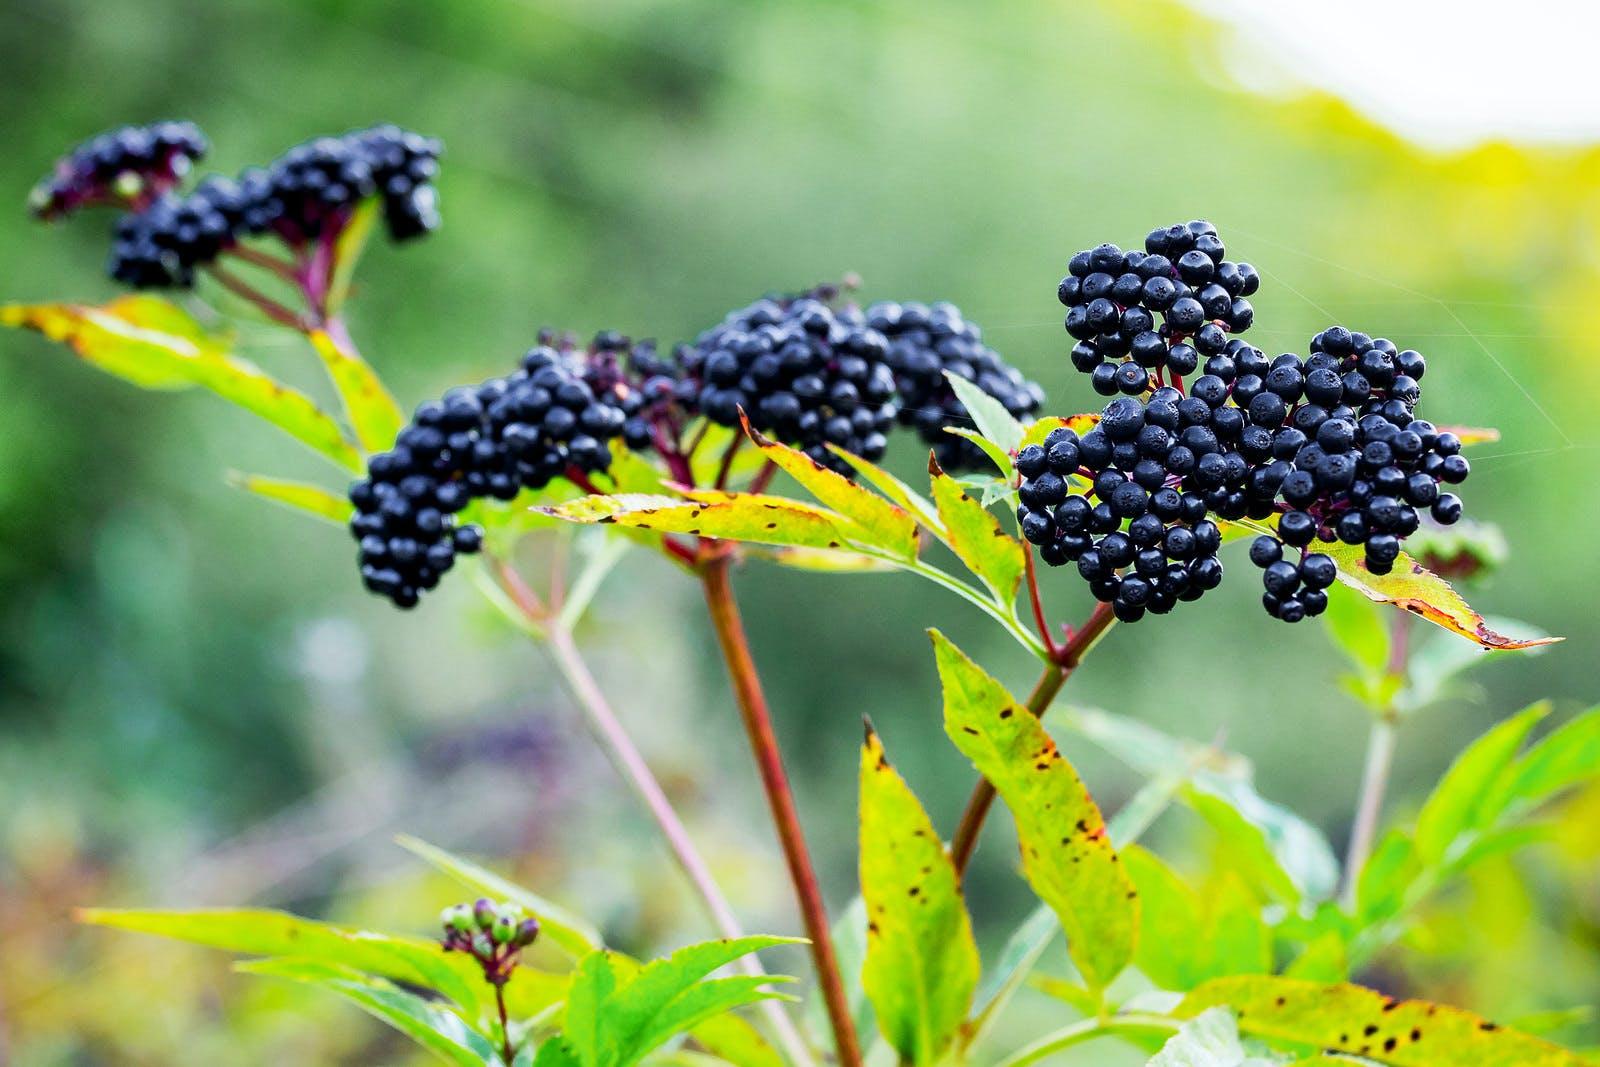 Elderberry berries Sambucus nigra